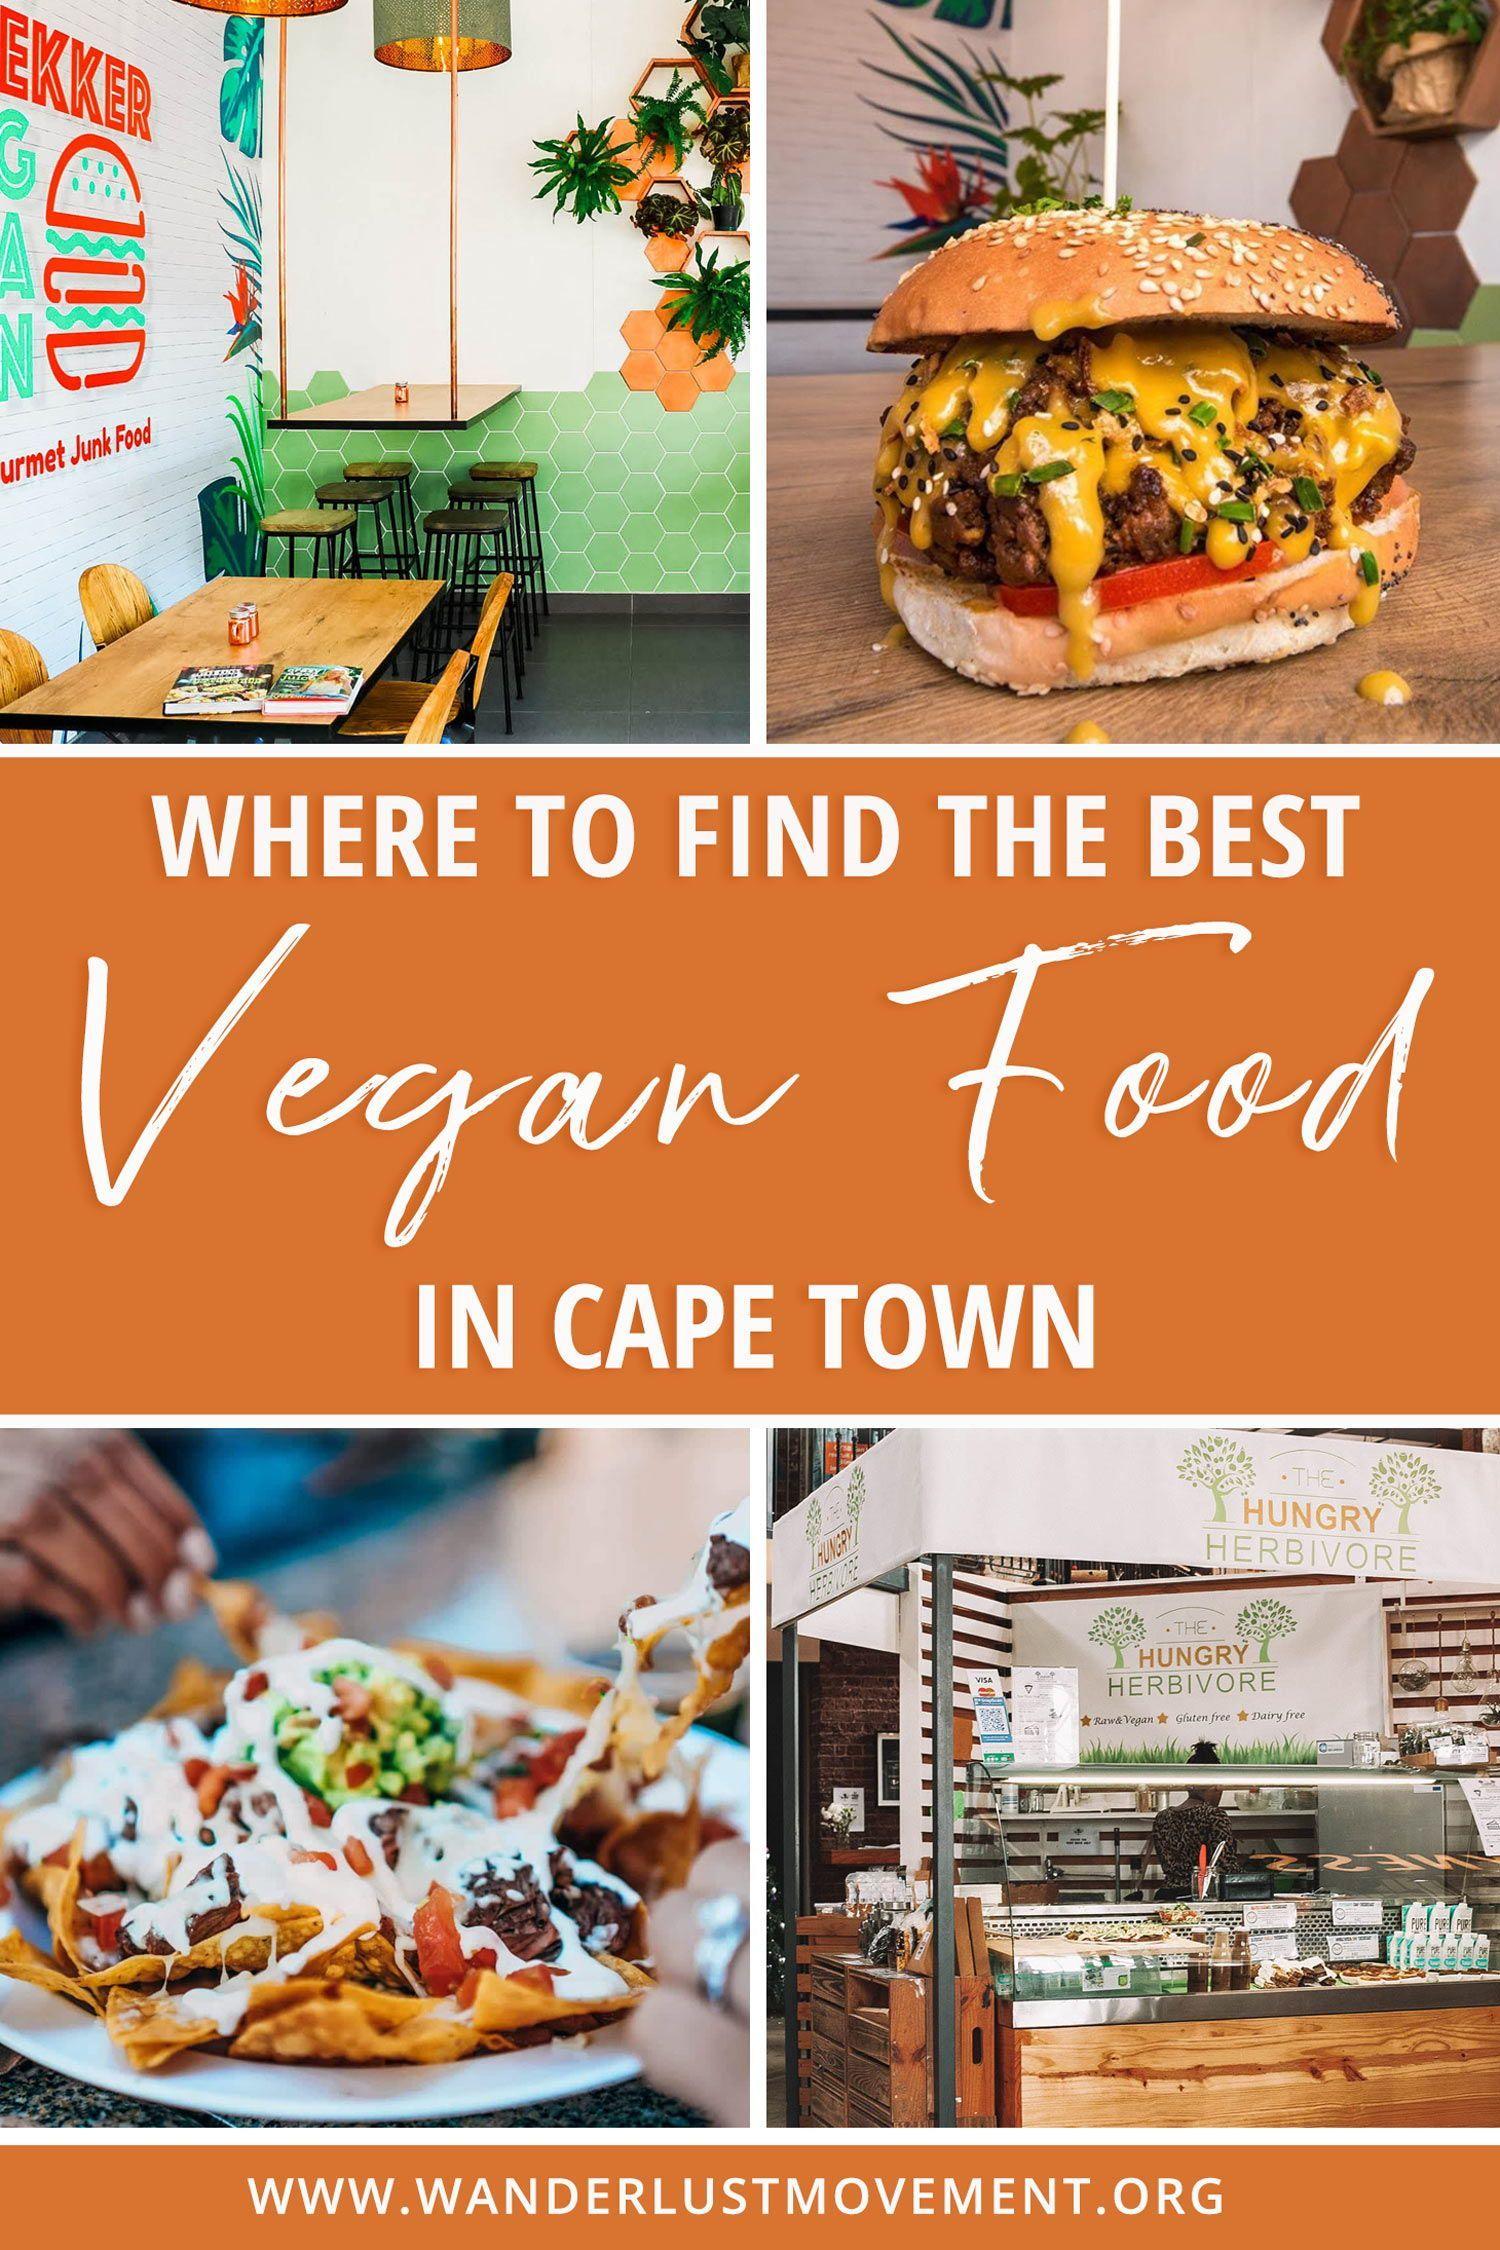 14 Delicious Vegan Restaurants In Cape Town You Need To Try In 2020 Best Vegan Restaurants Vegan Friendly Restaurants Vegan Restaurants